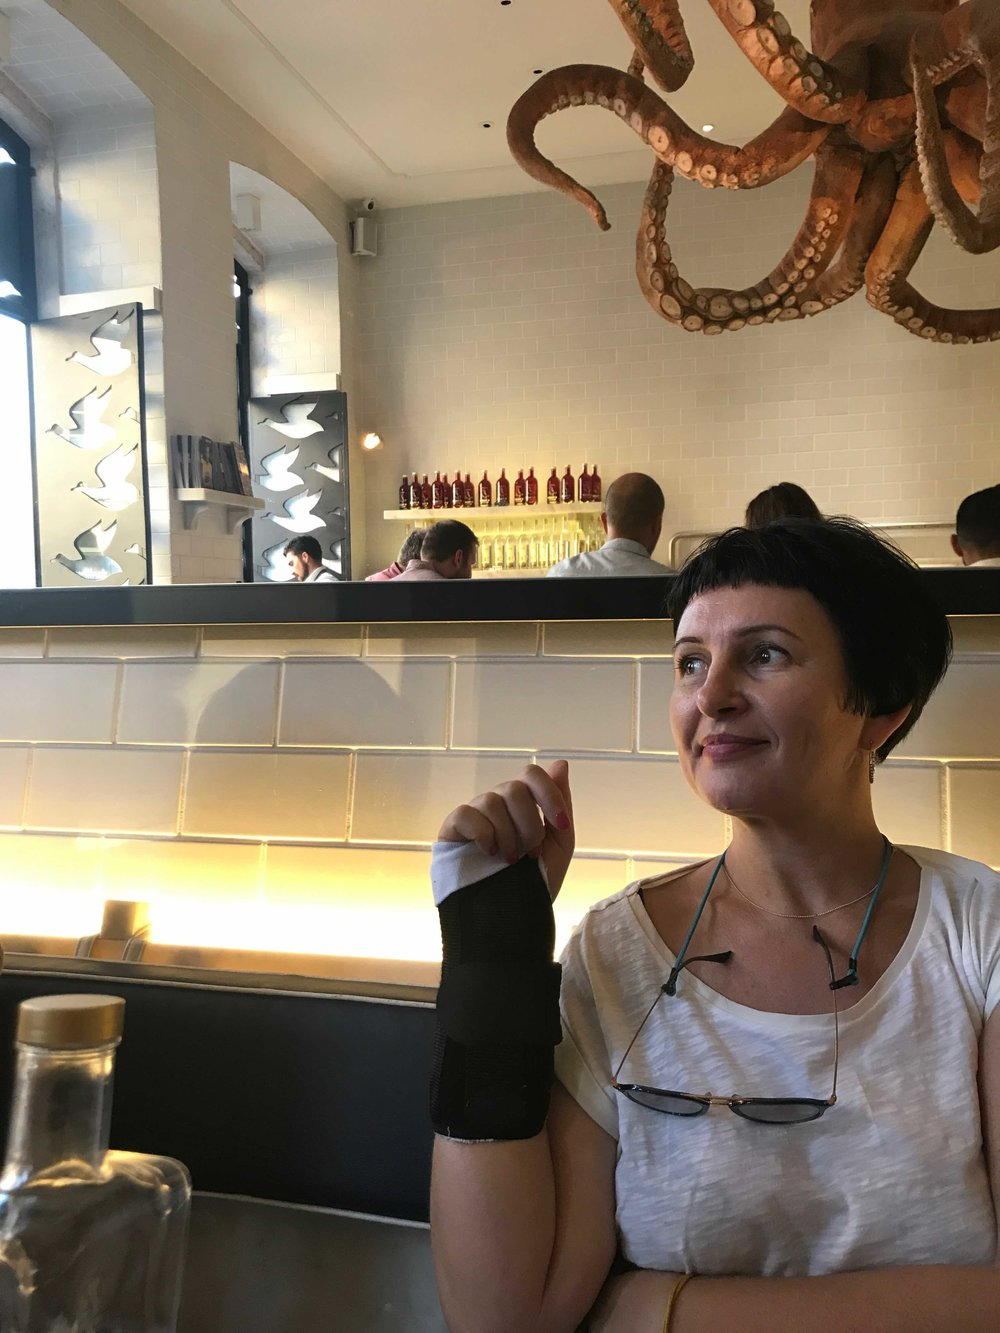 #othalo #lissabon #portugal #disawistories #chefkiko #porträt.jpg